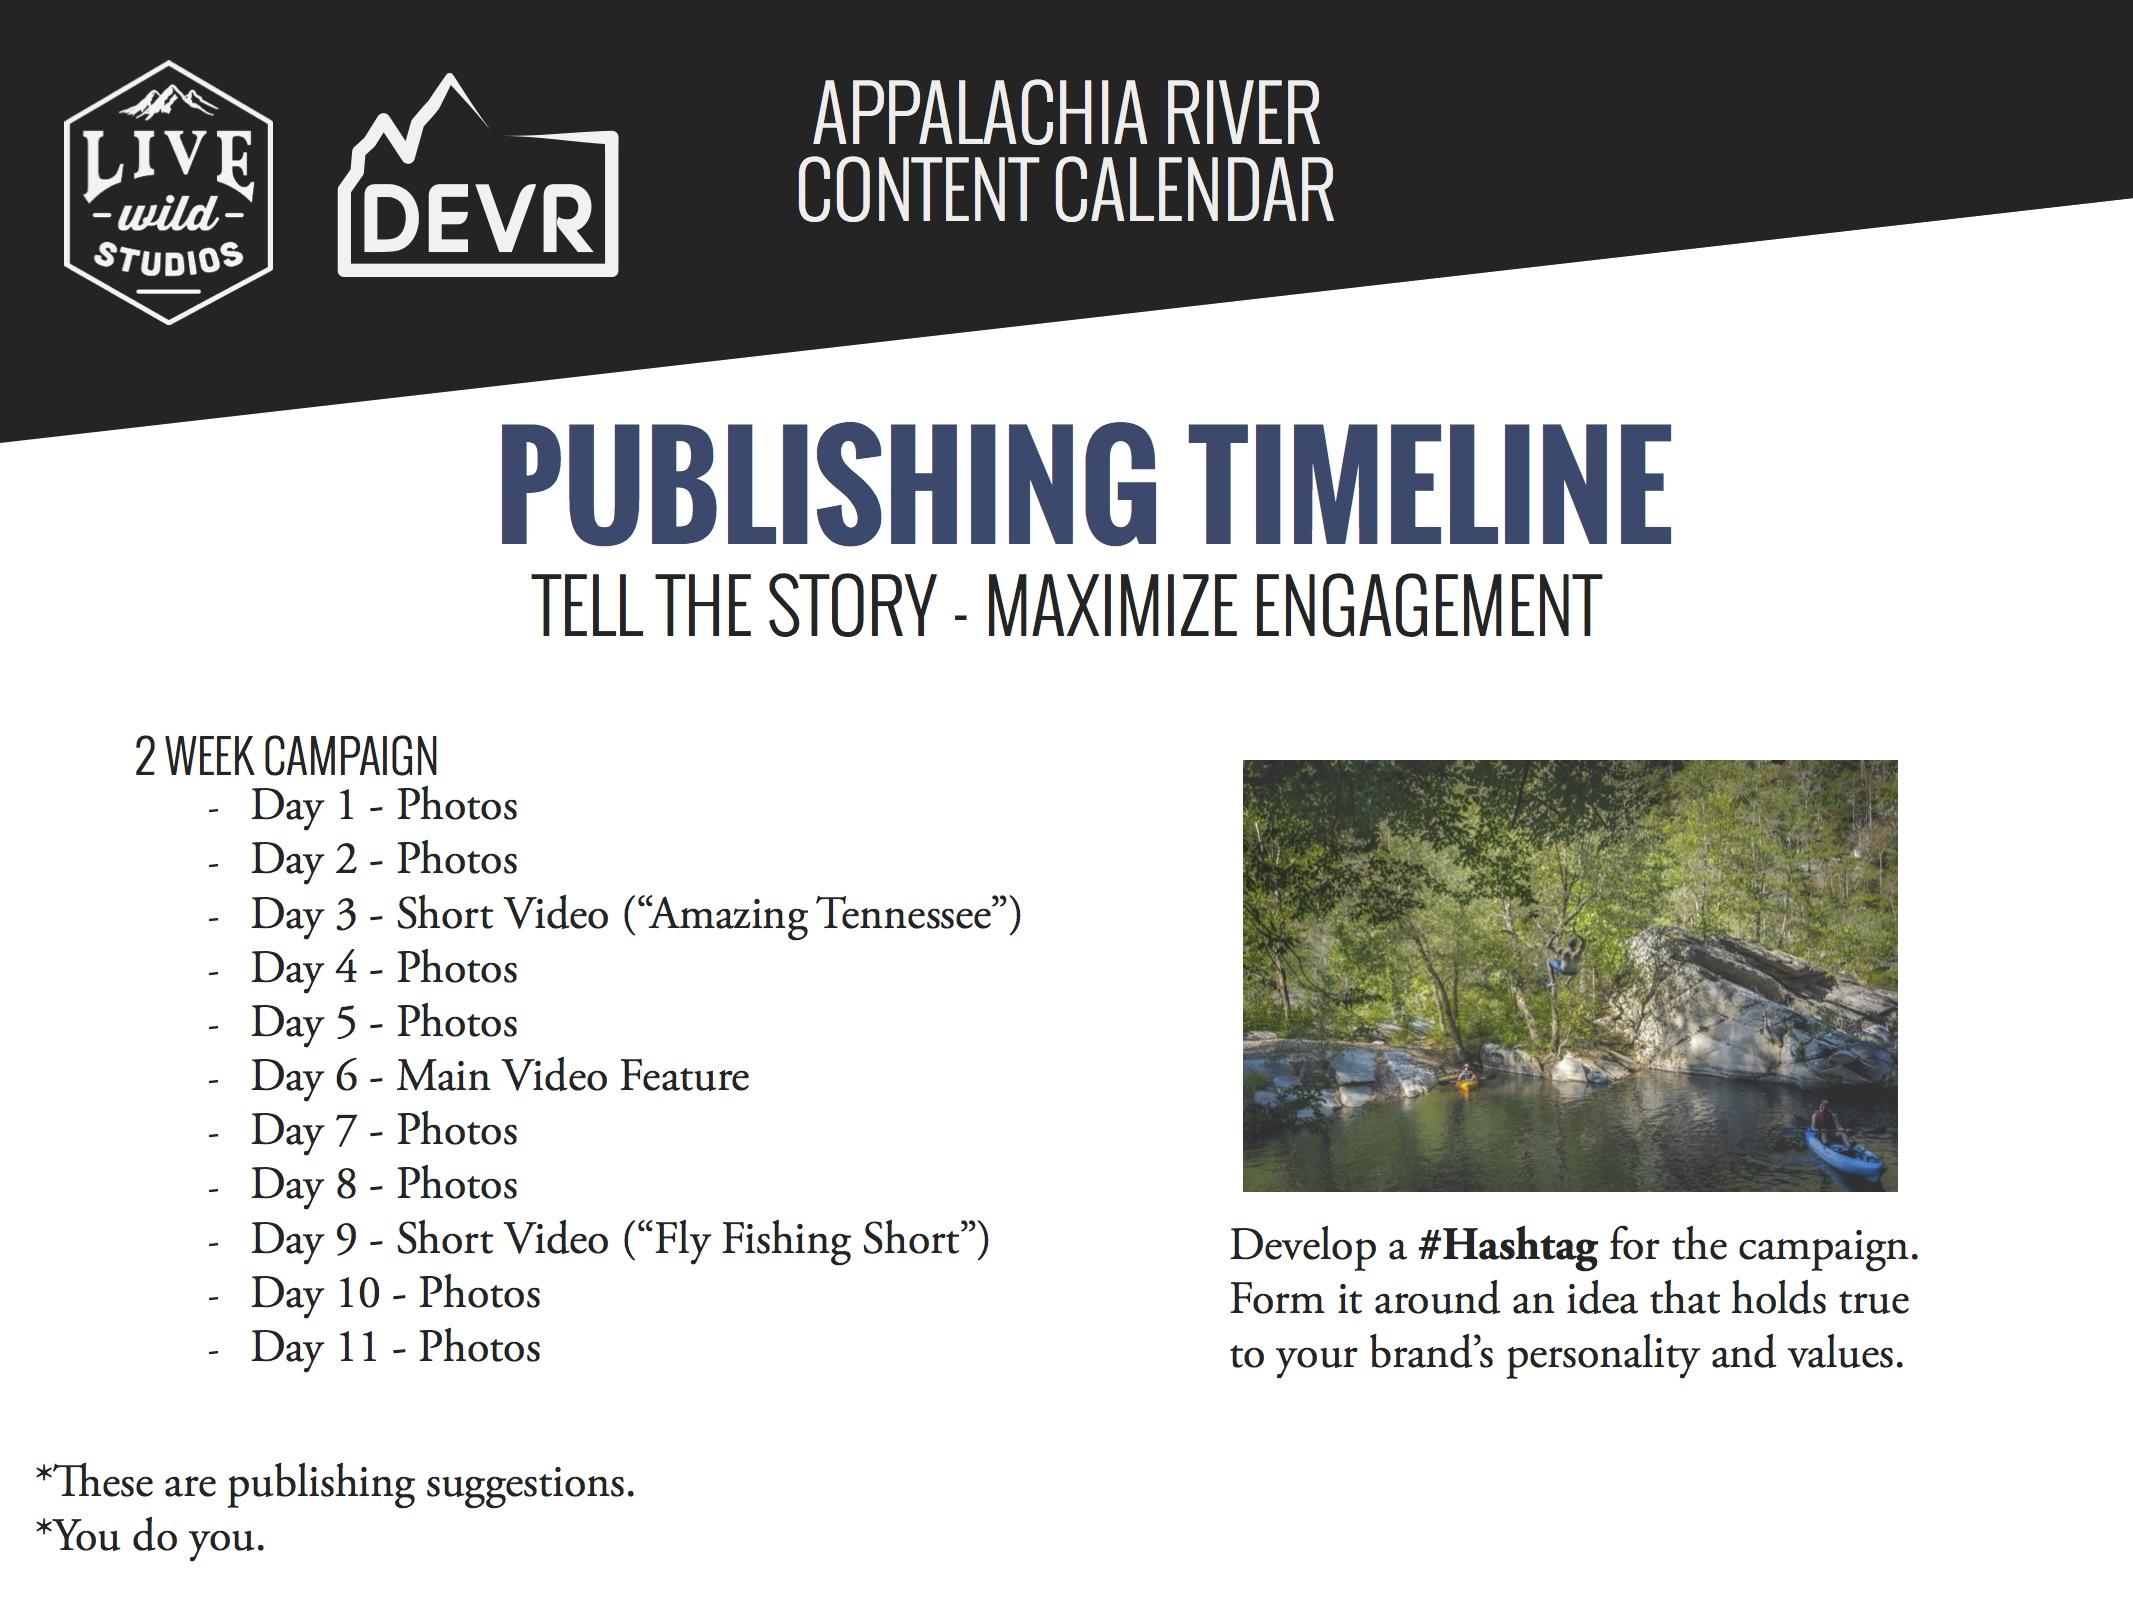 Appalachia River Adventure 2016 Campaign Guide 4.jpg